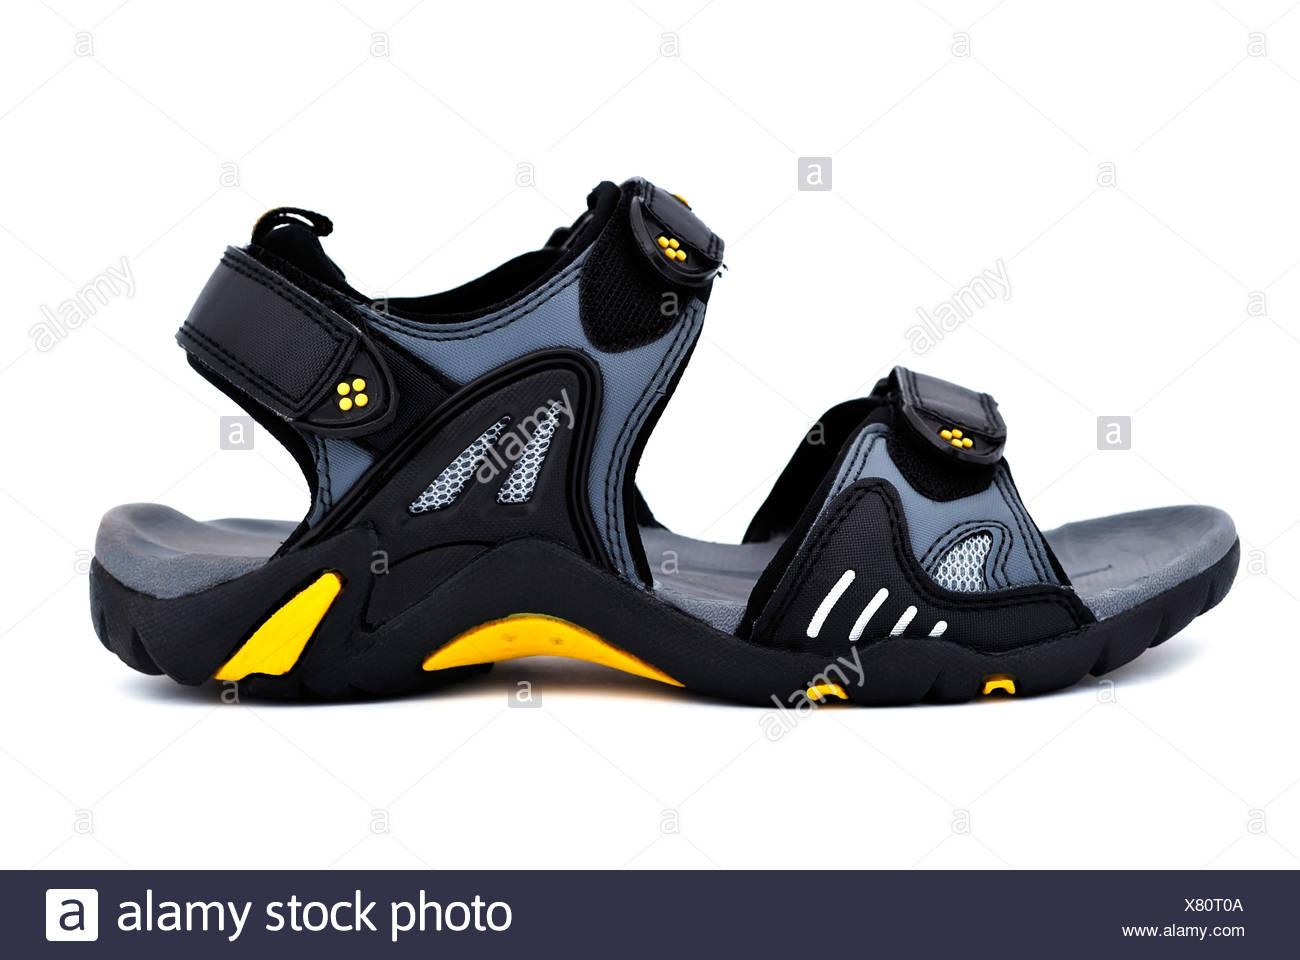 Sandalias para hombre Imagen De Stock